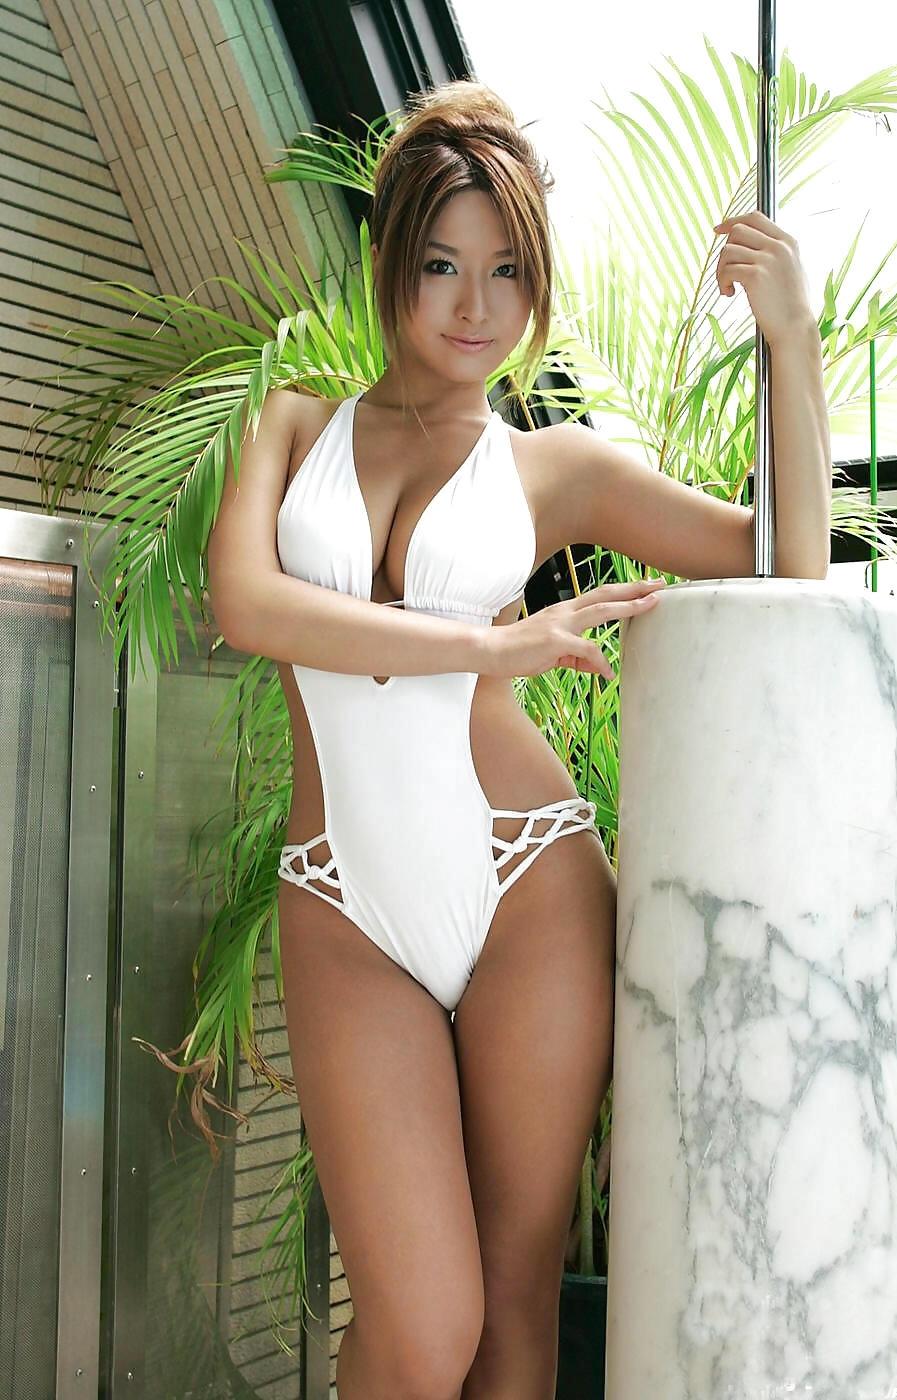 Asian hot zone, tennis xxx photos